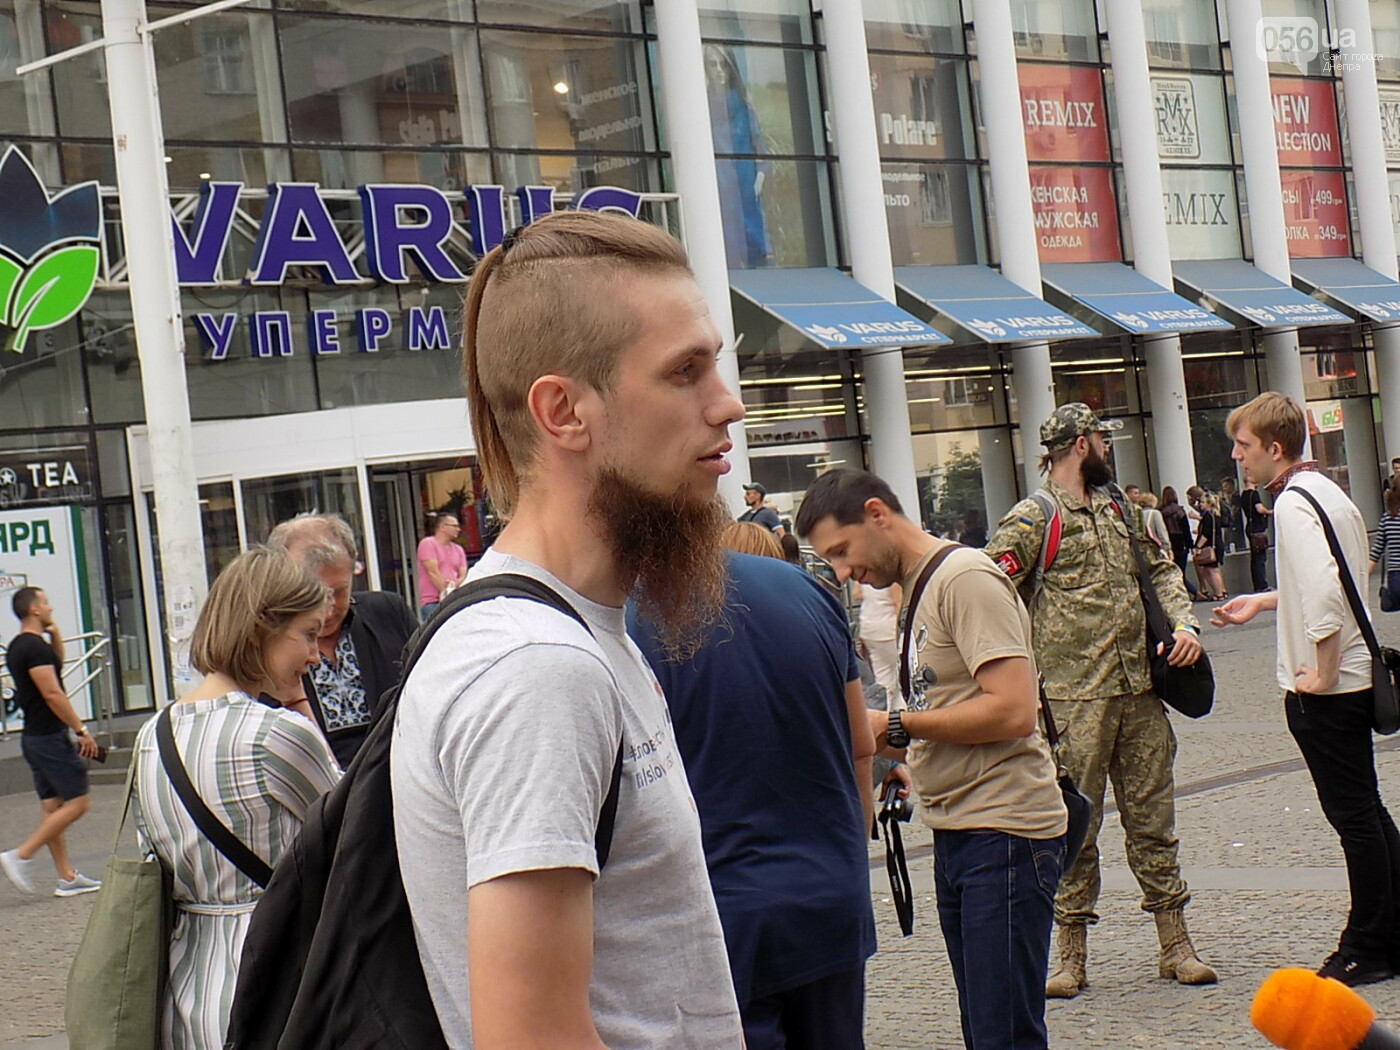 """Мова єднає Дніпро"": в центре города прошла символическая акция с концертом и подарками, - ФОТО, фото-5"